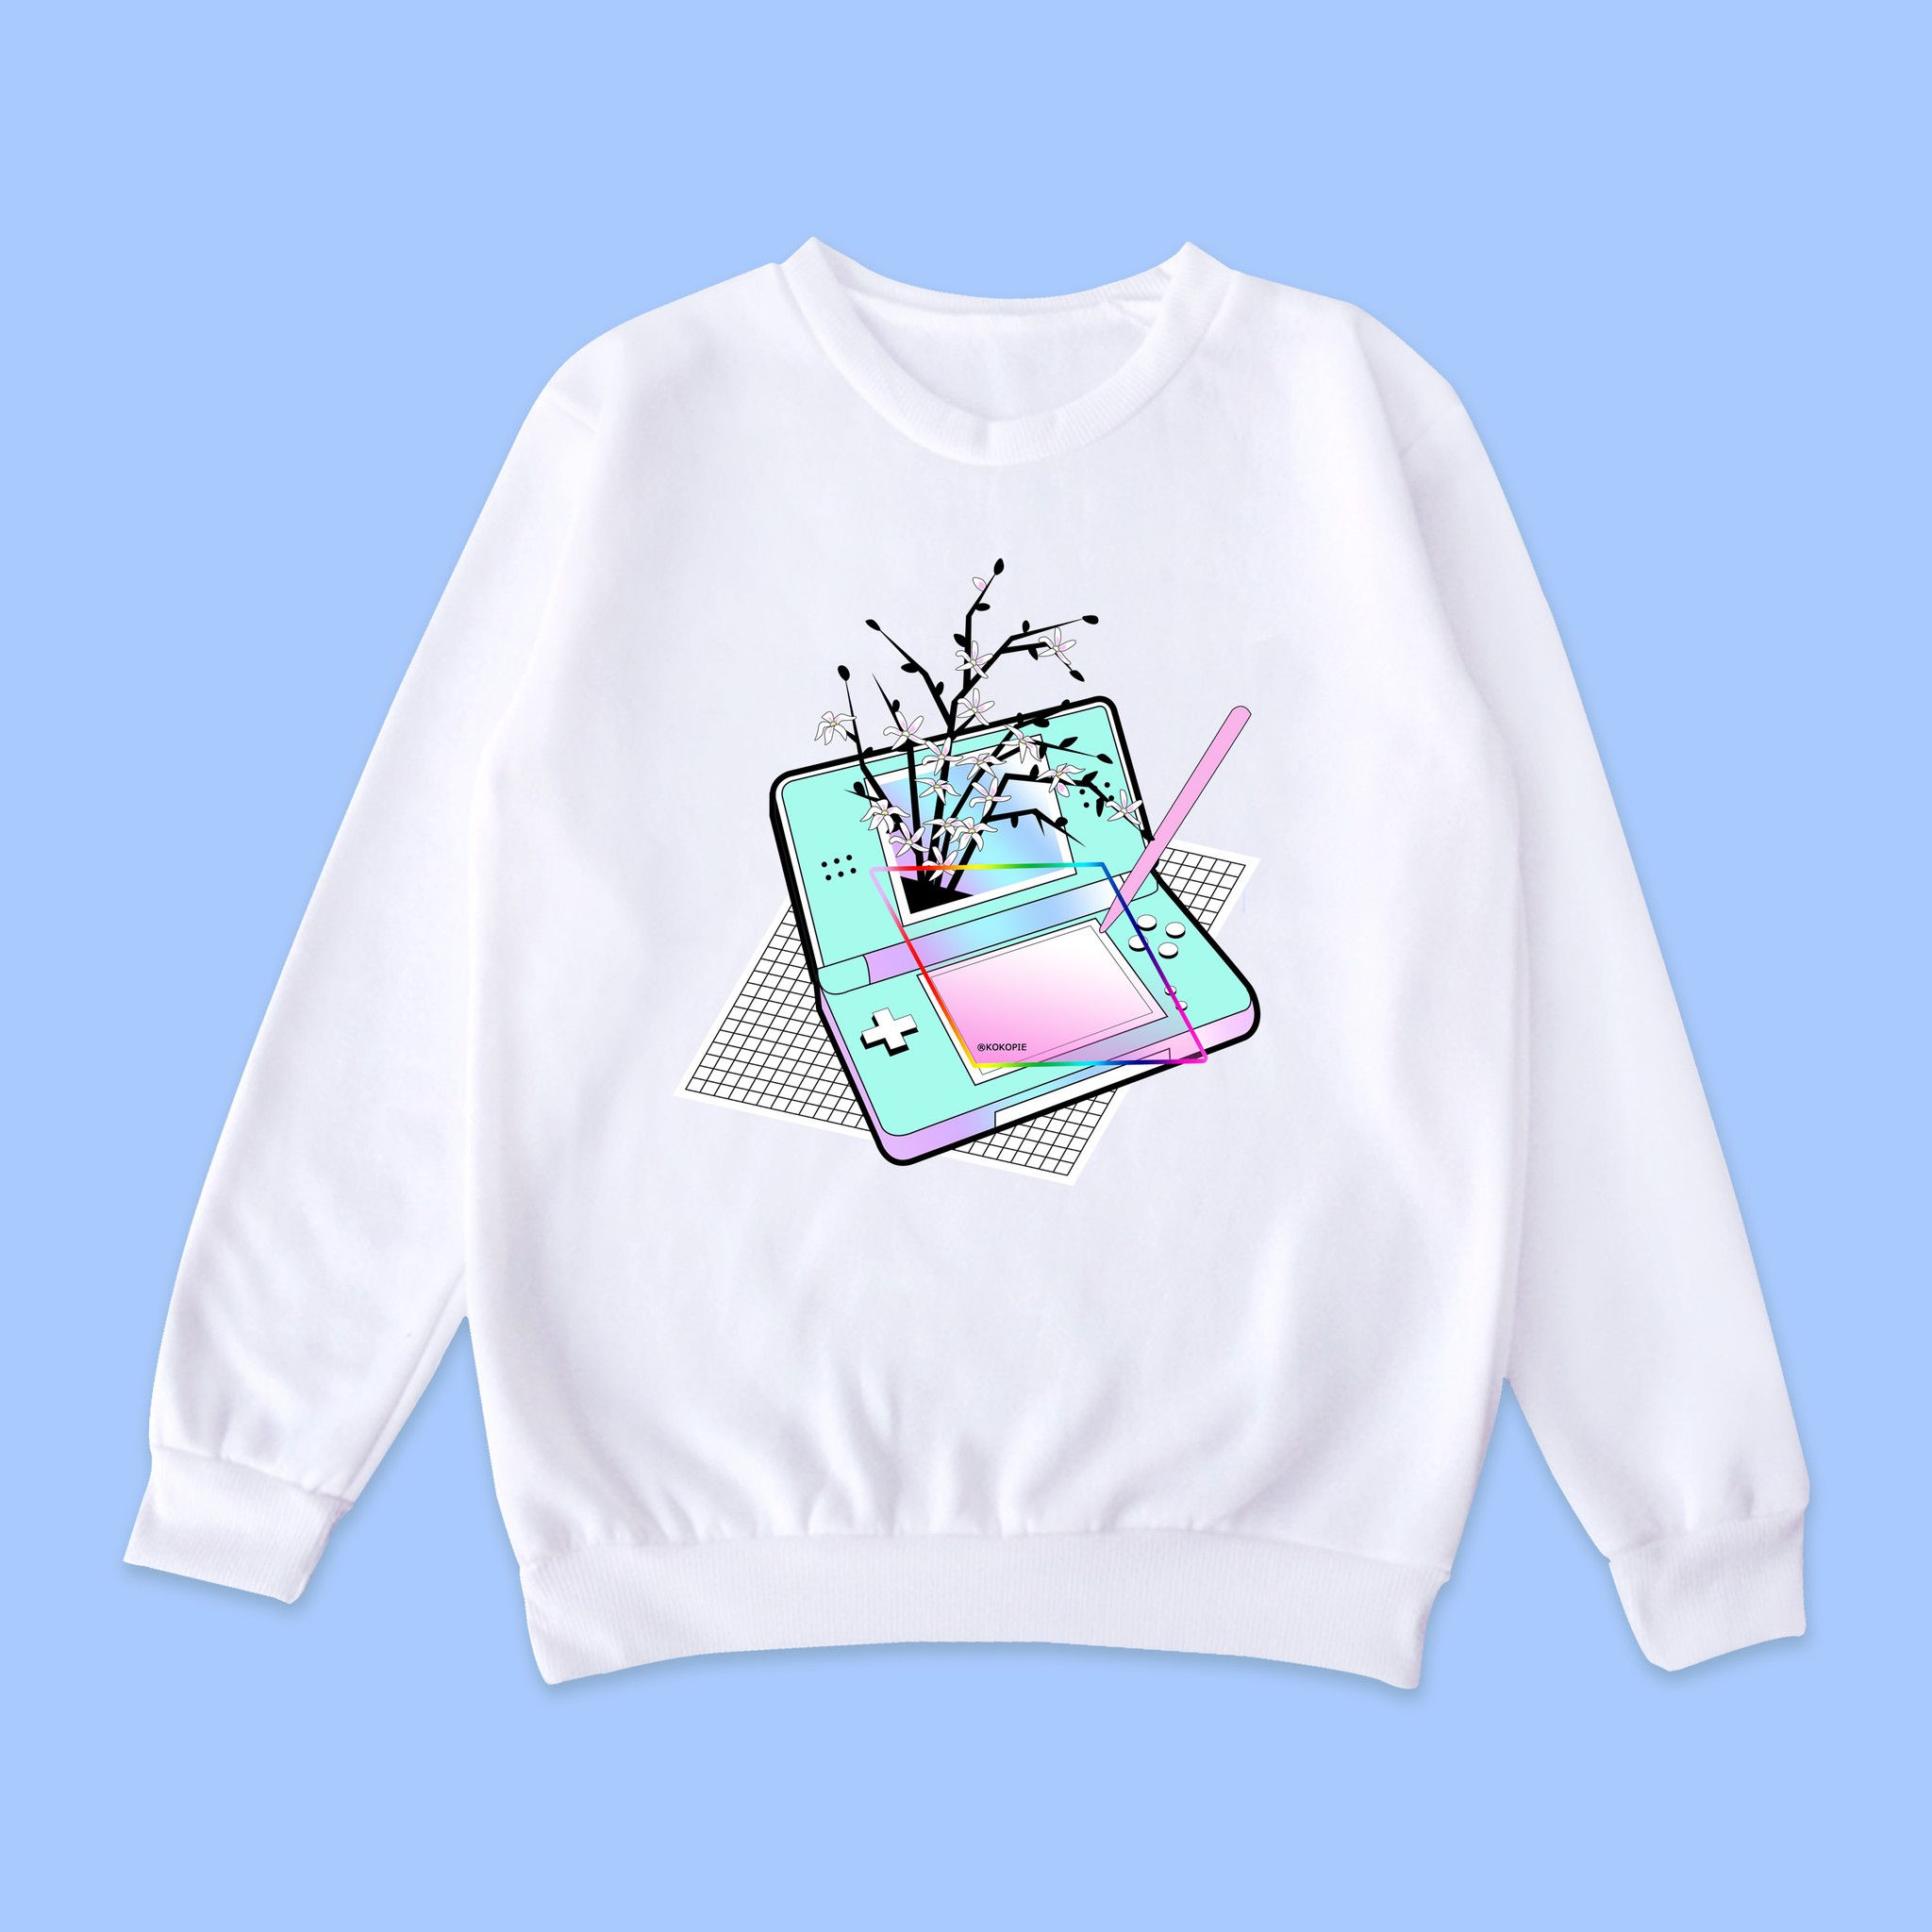 Vaporwave-tumblr-aesthetic NINTENDO jumper | Ropa kawaii ...